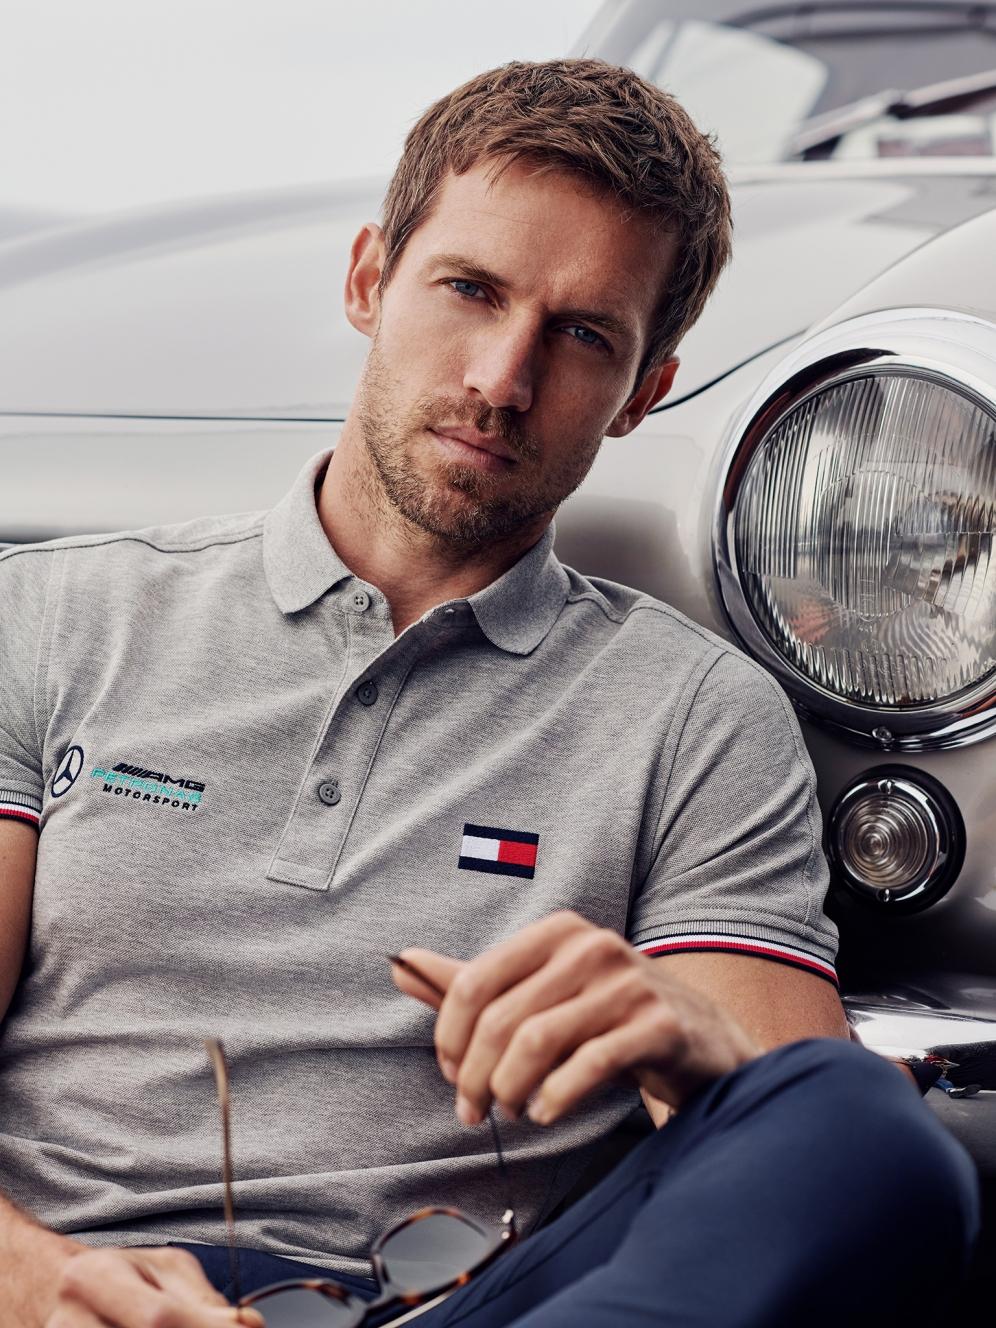 Tommy Hilfiger x Mercedes Benz